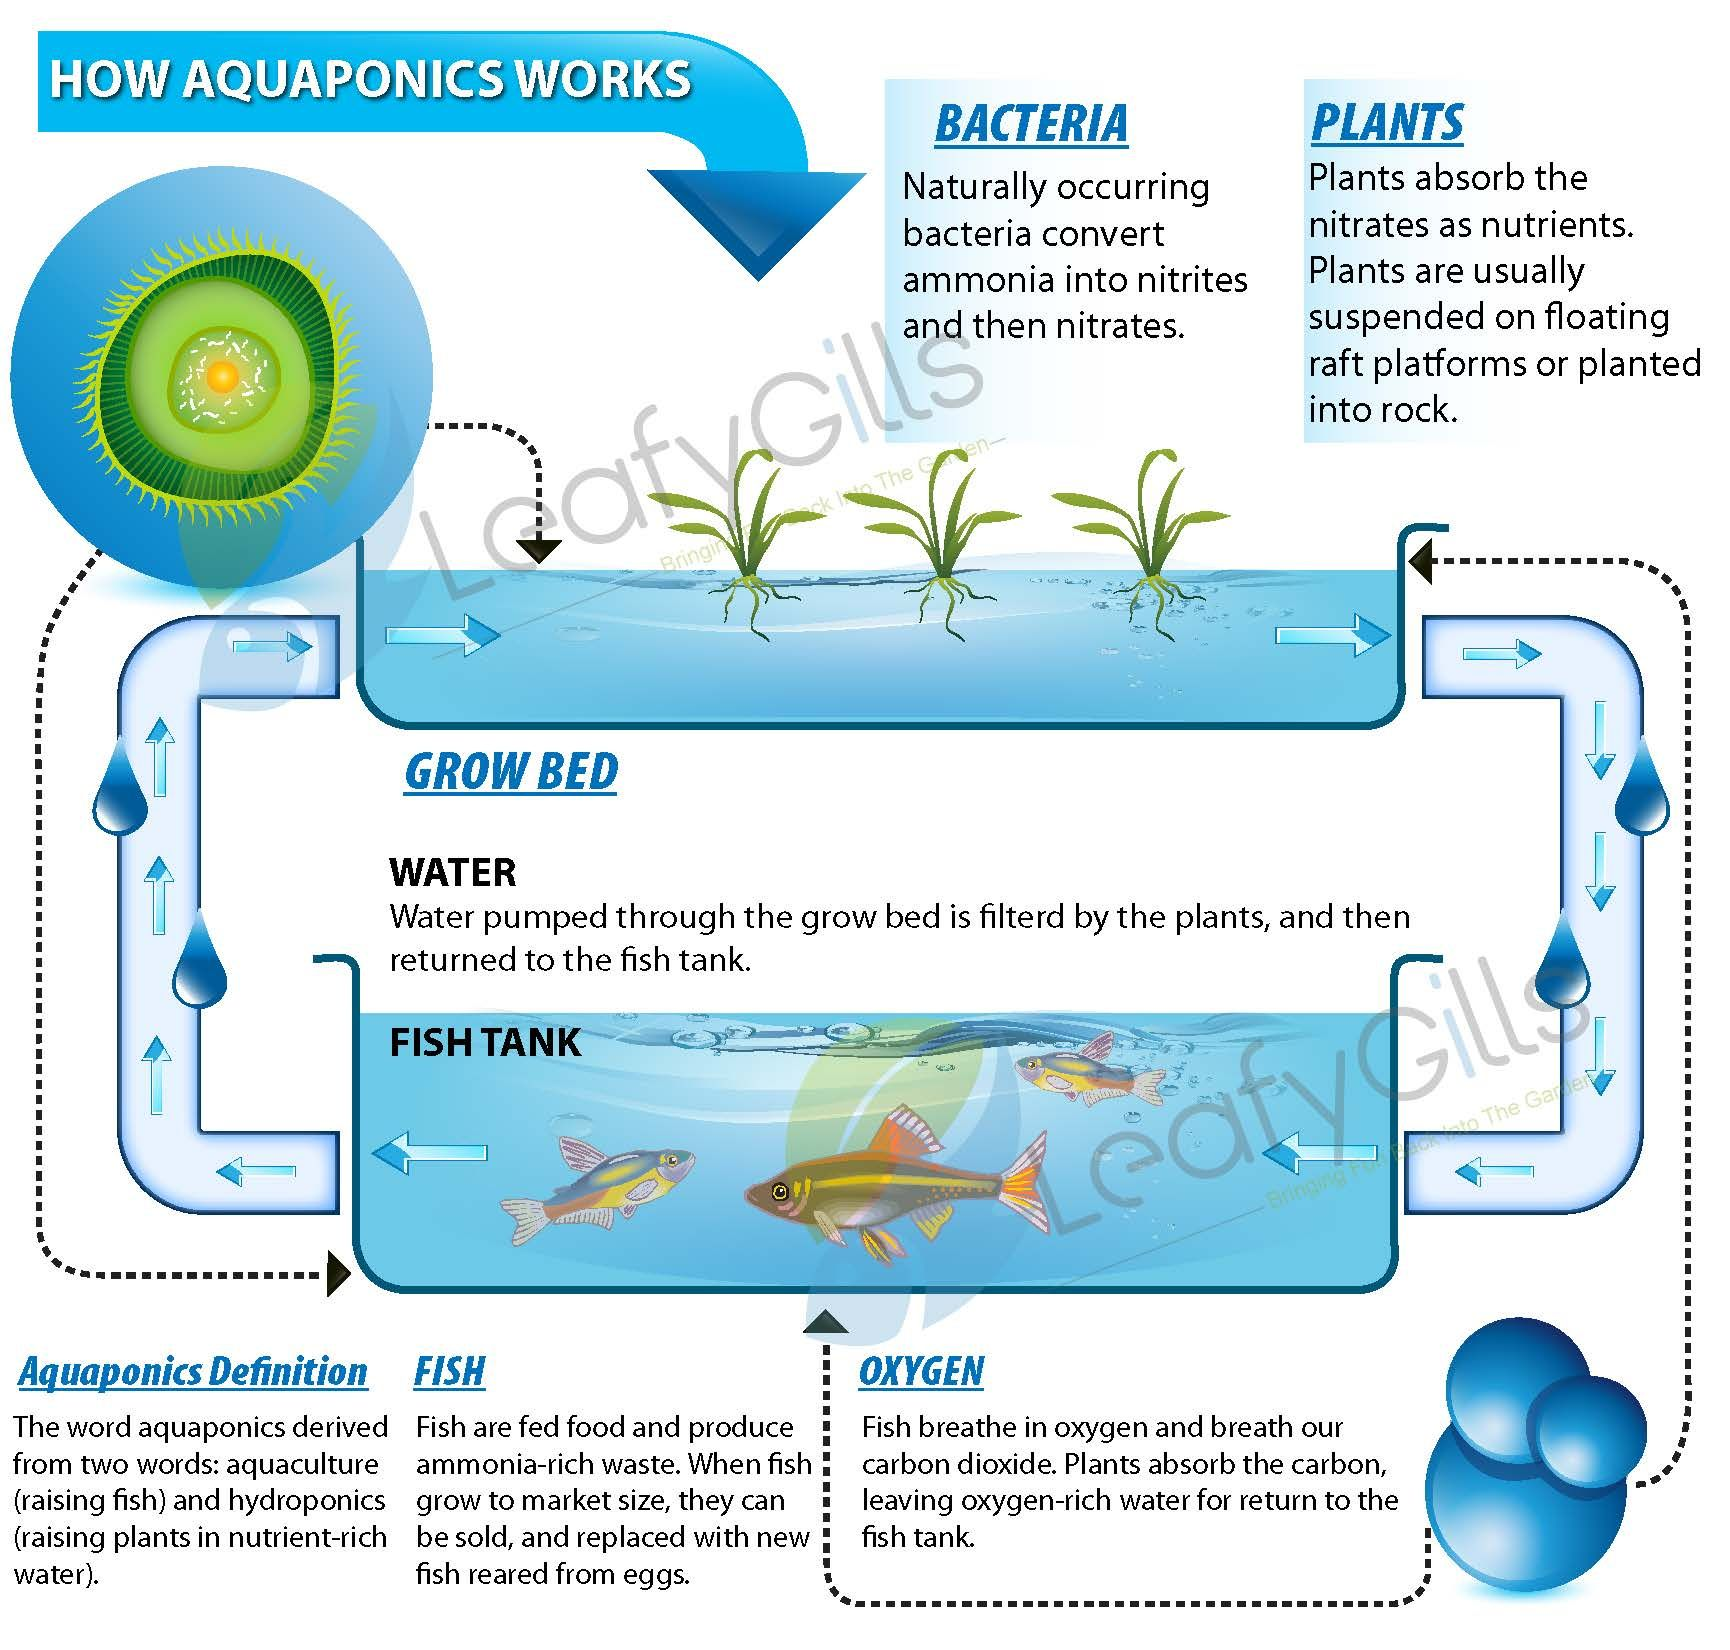 aquaponics system the benefits of aquaponics include  [ 1730 x 1650 Pixel ]